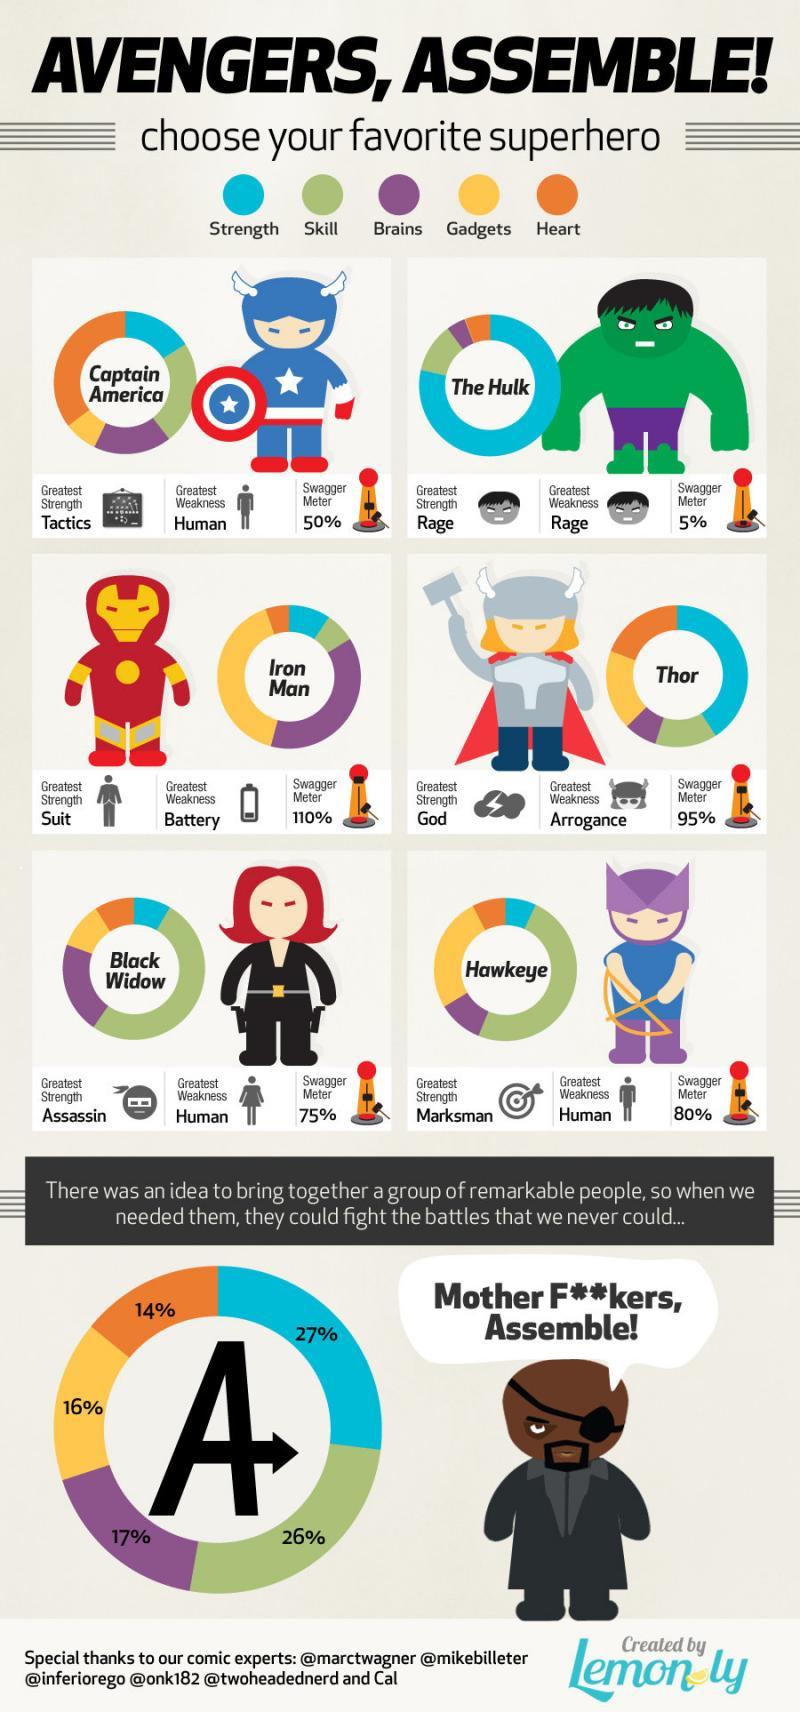 Avengers Assemble - Choose your favorite superhero #Infographic